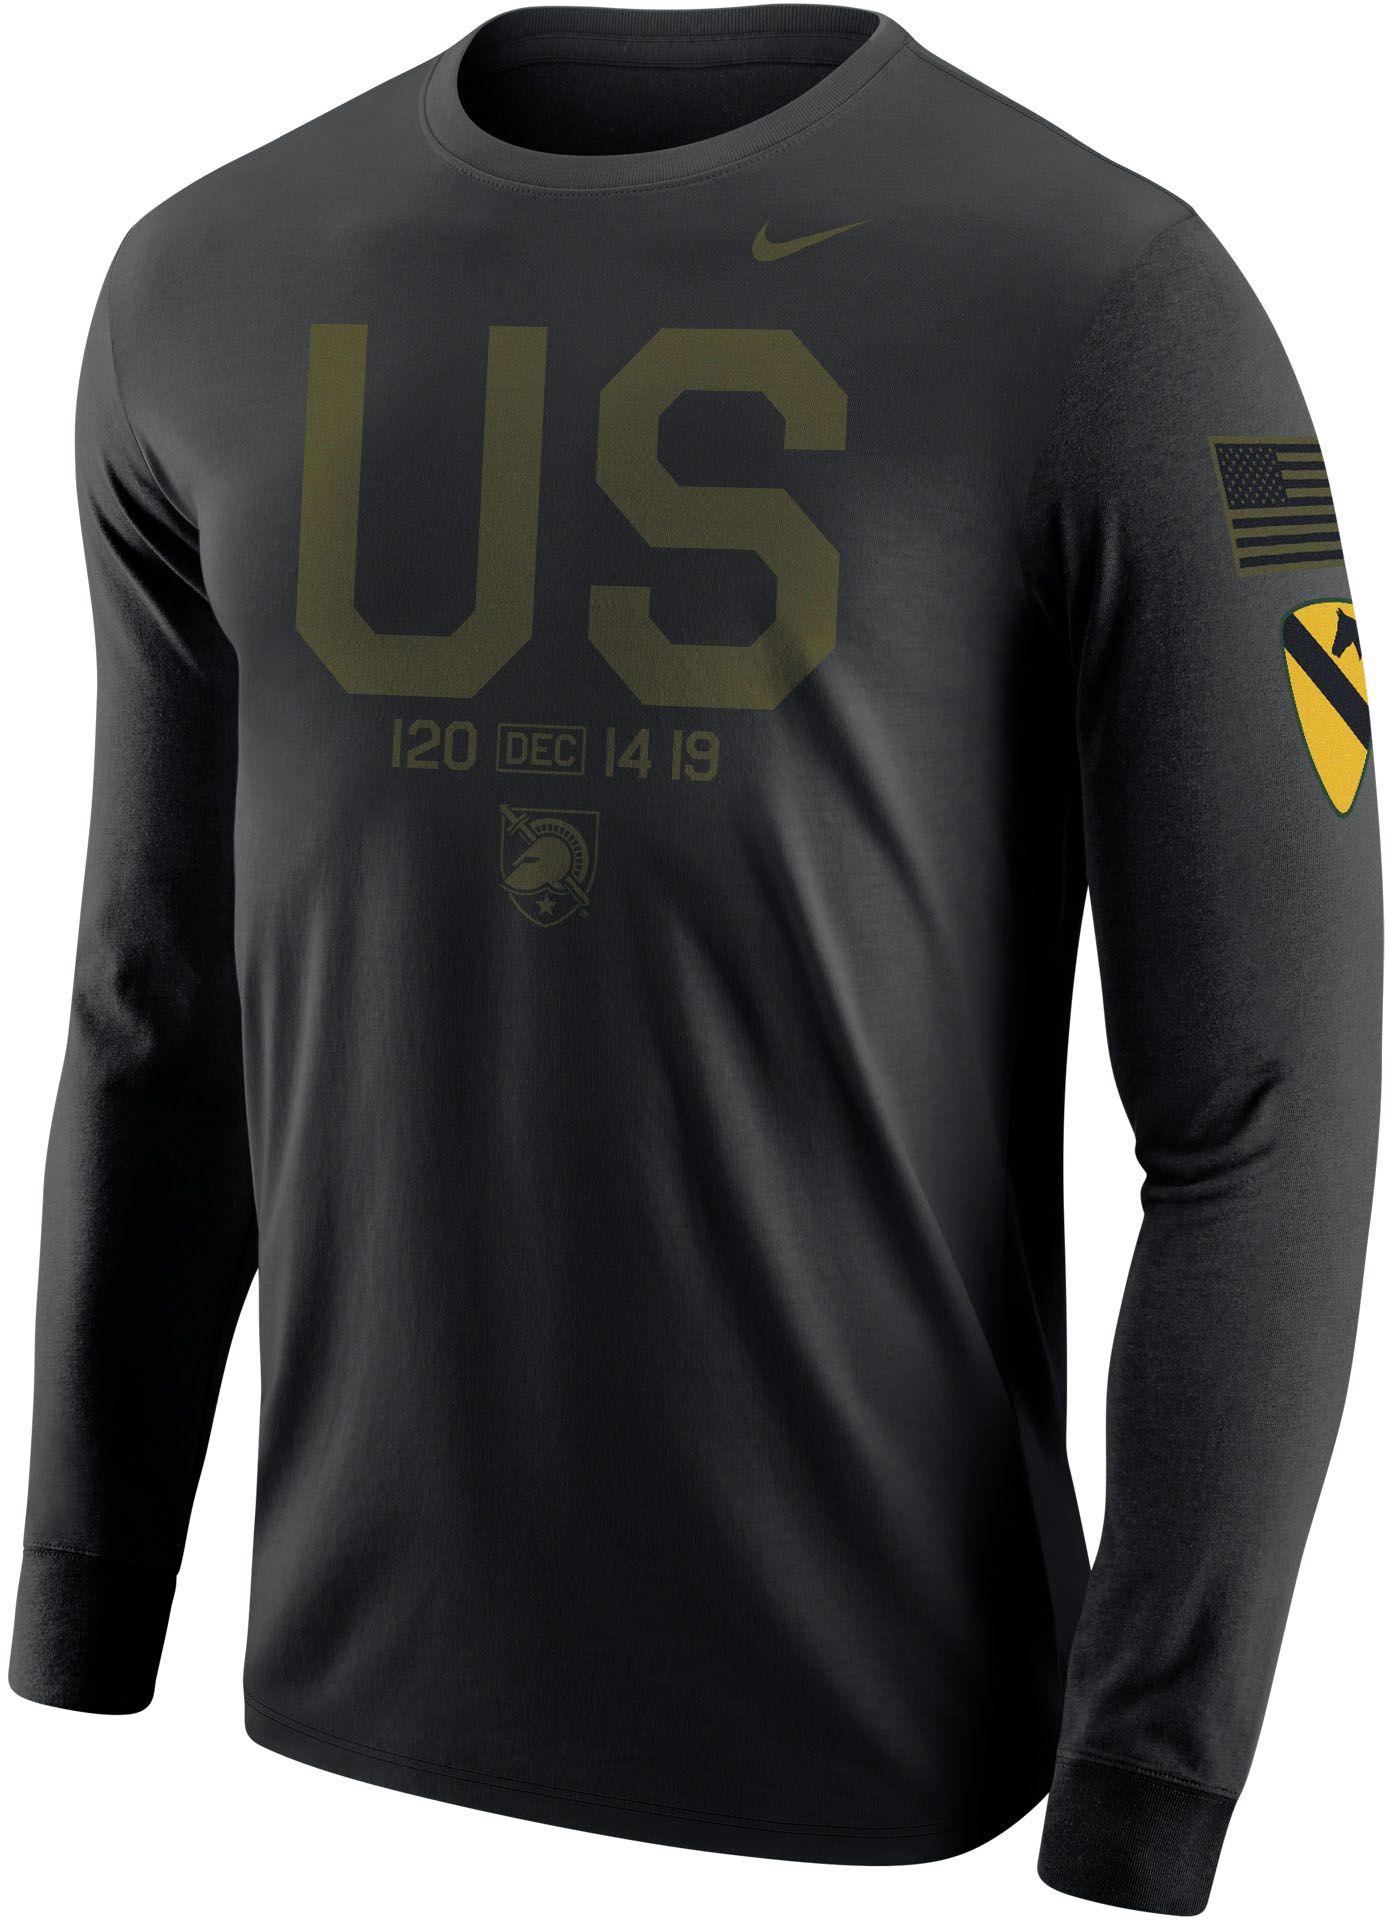 Nike Men's Army West Point Black Knights Dri-FIT Rivalry Football Long Sleeve Black T-Shirt